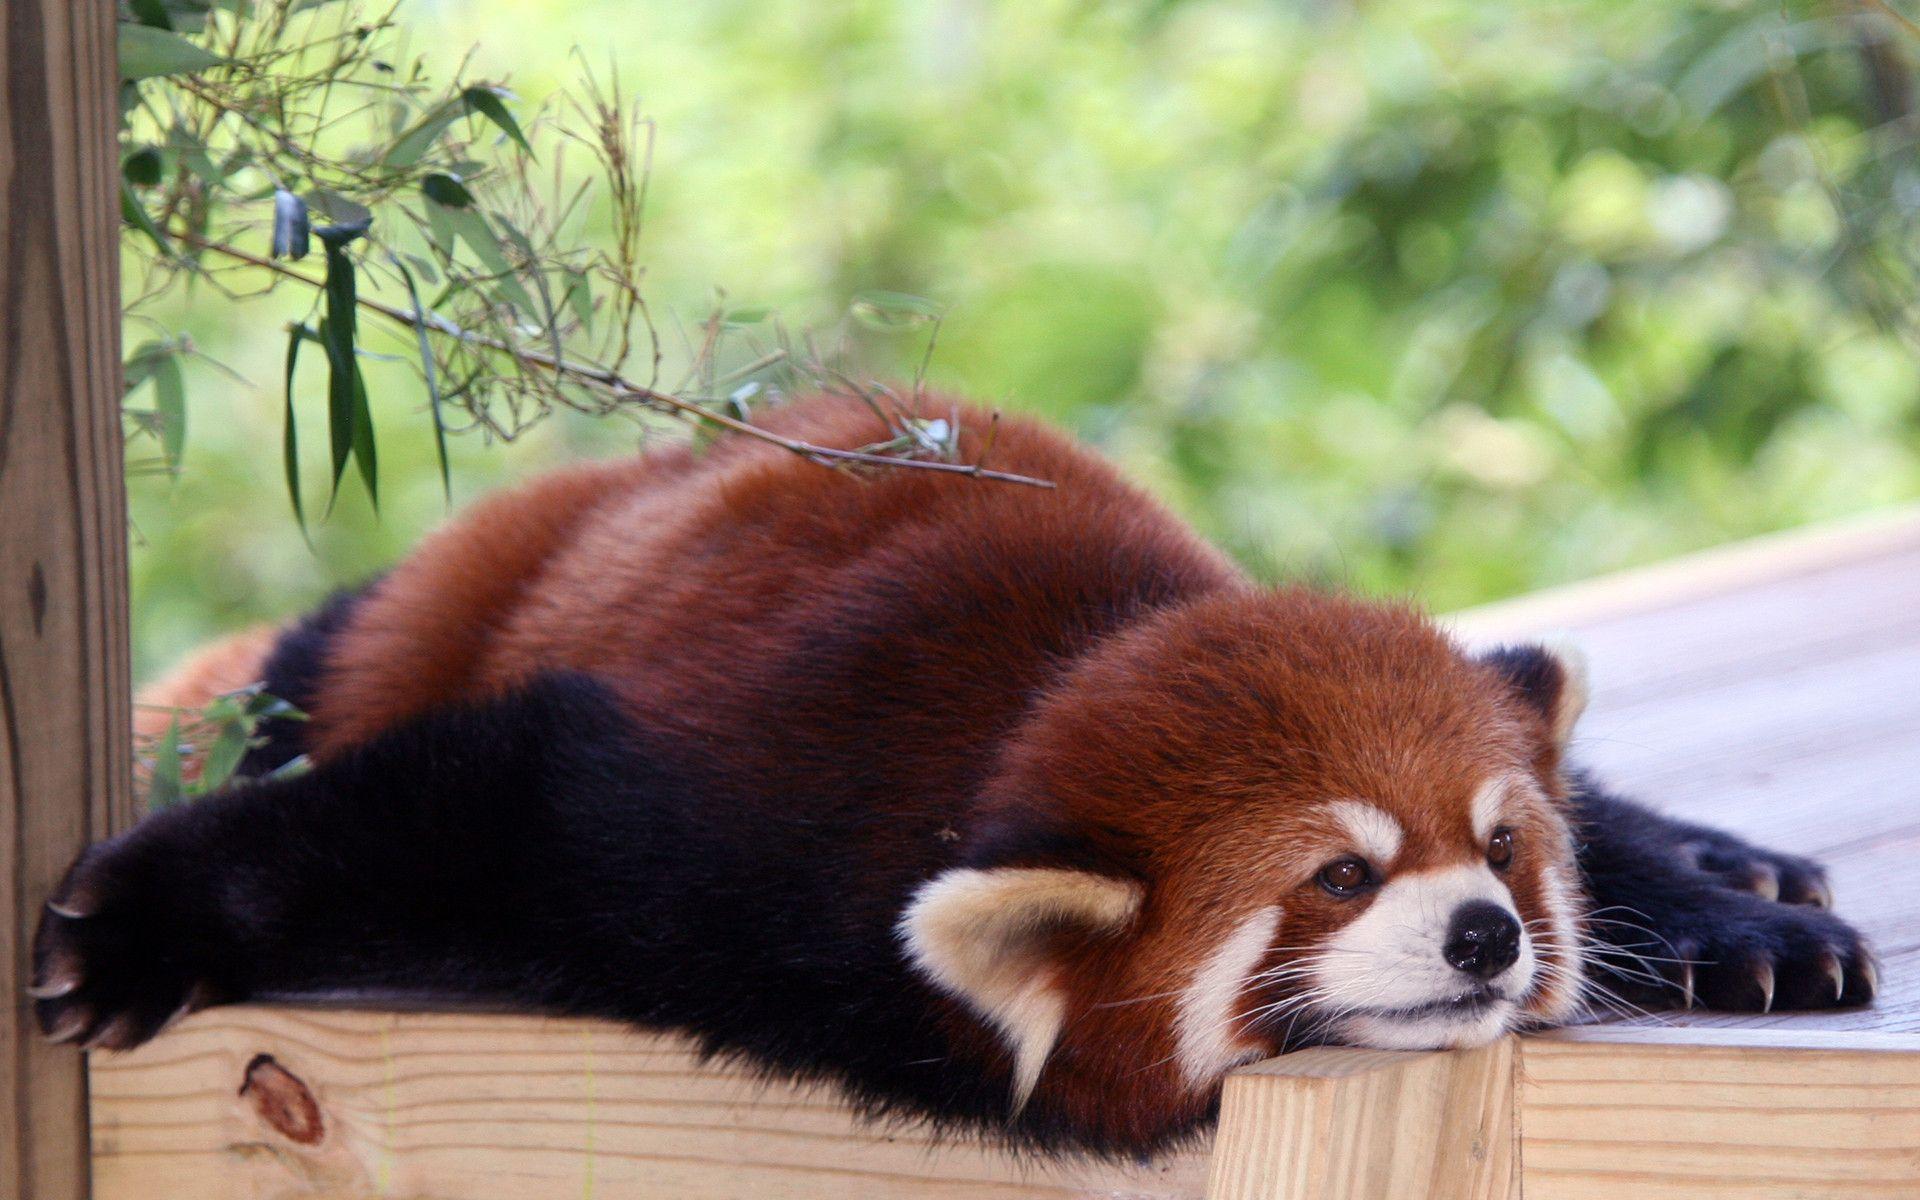 Cute Sleeping Babies Wallpapers Red Panda Backgrounds Wallpaper Cave